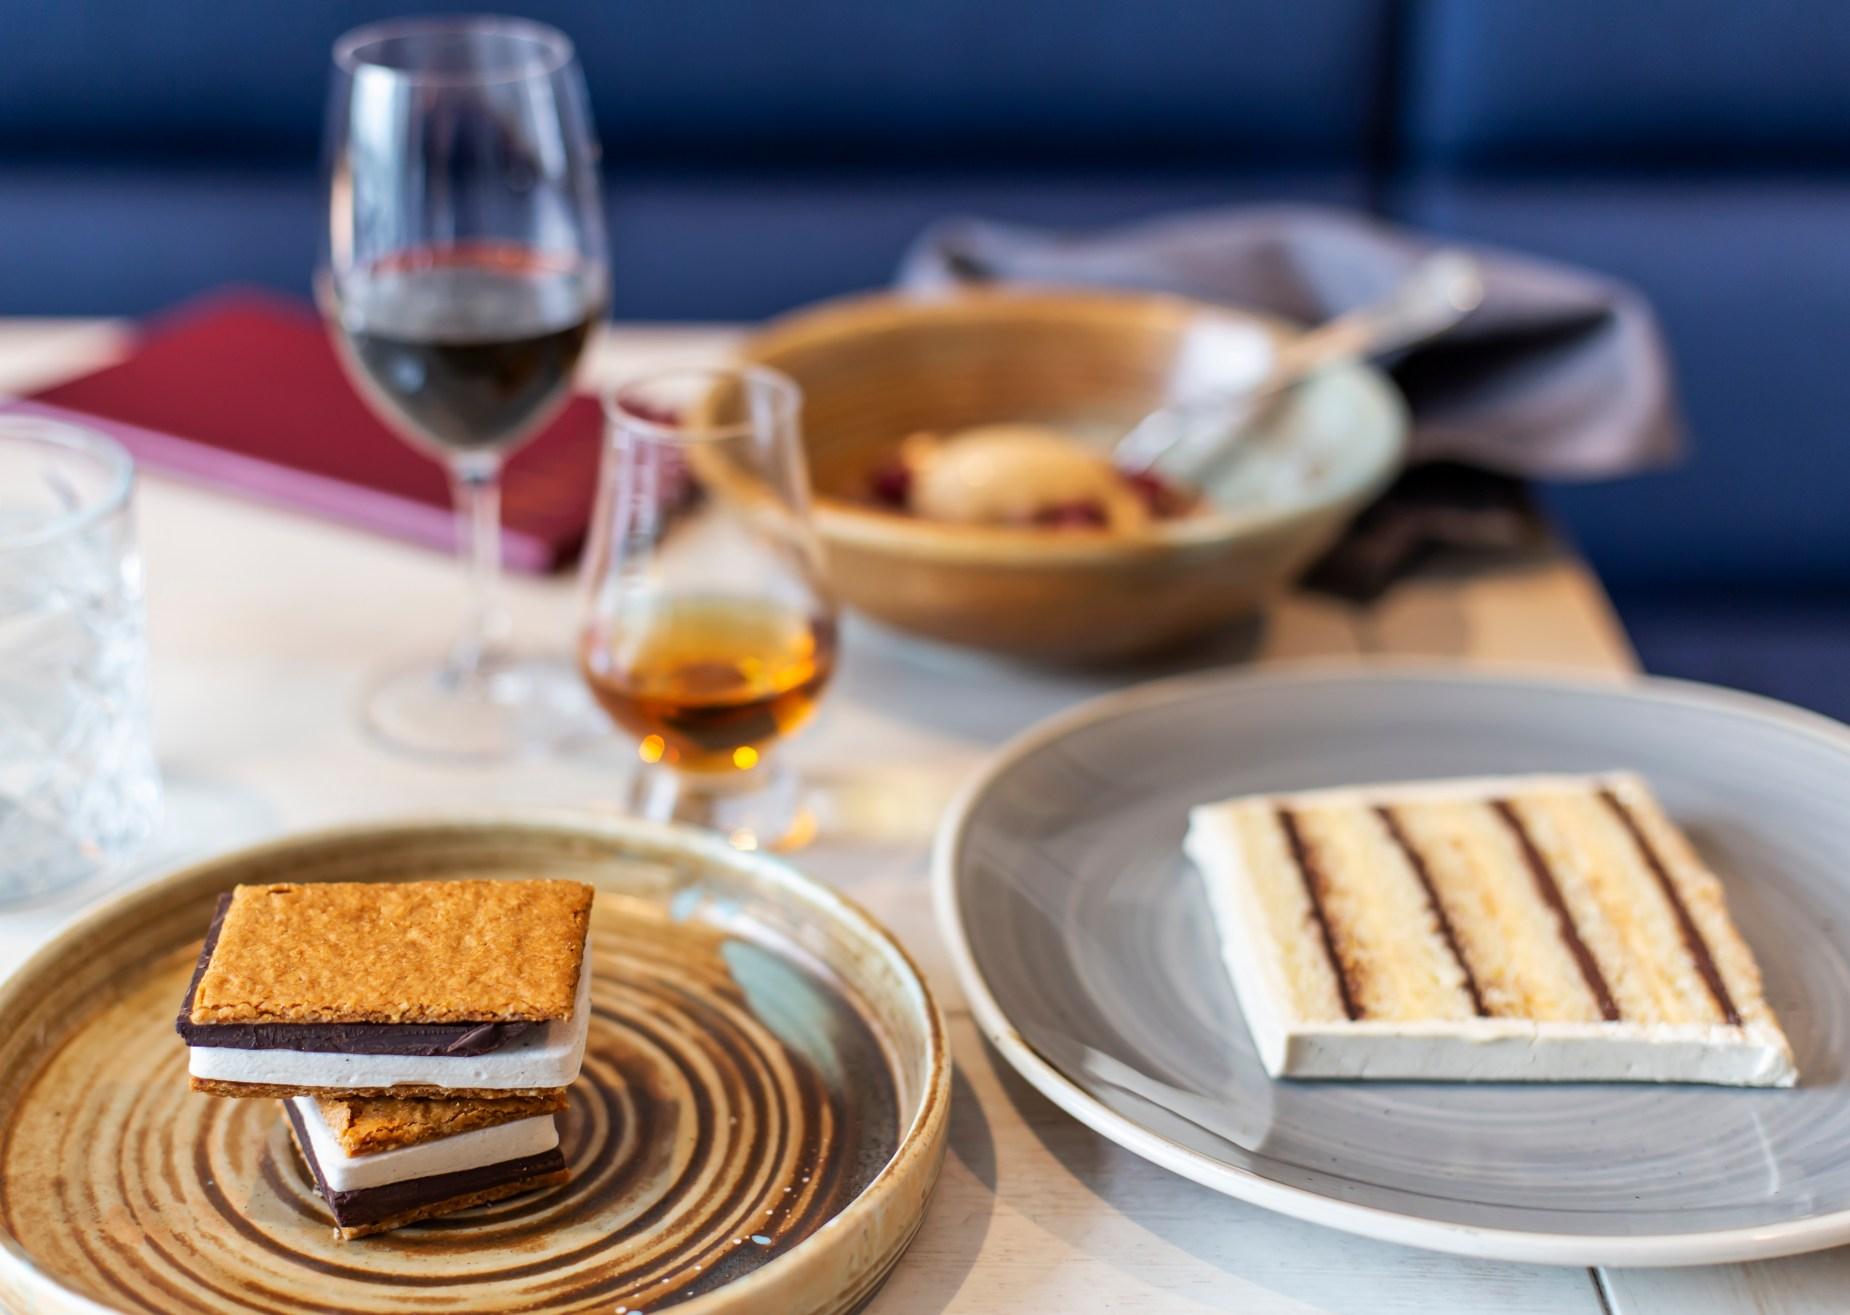 NOLA Smokehouse & Bar – New Orleans inspired desserts